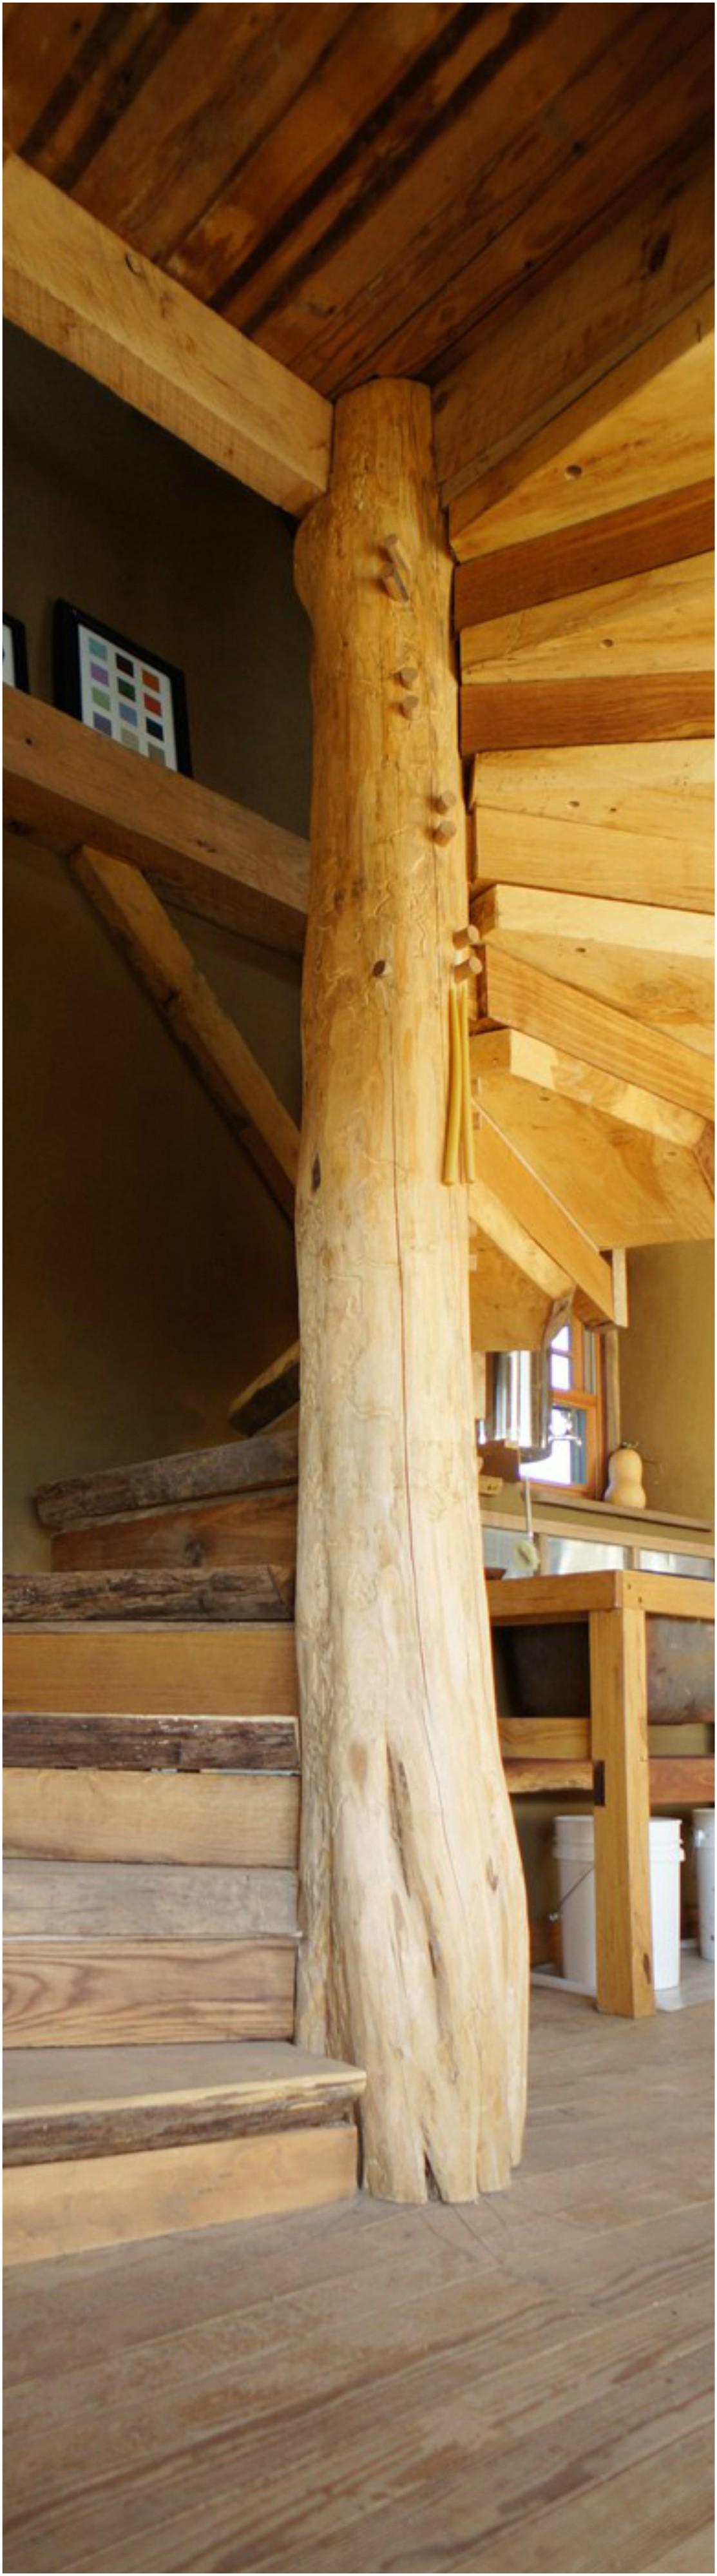 Wooden Spiral Staircase (25)